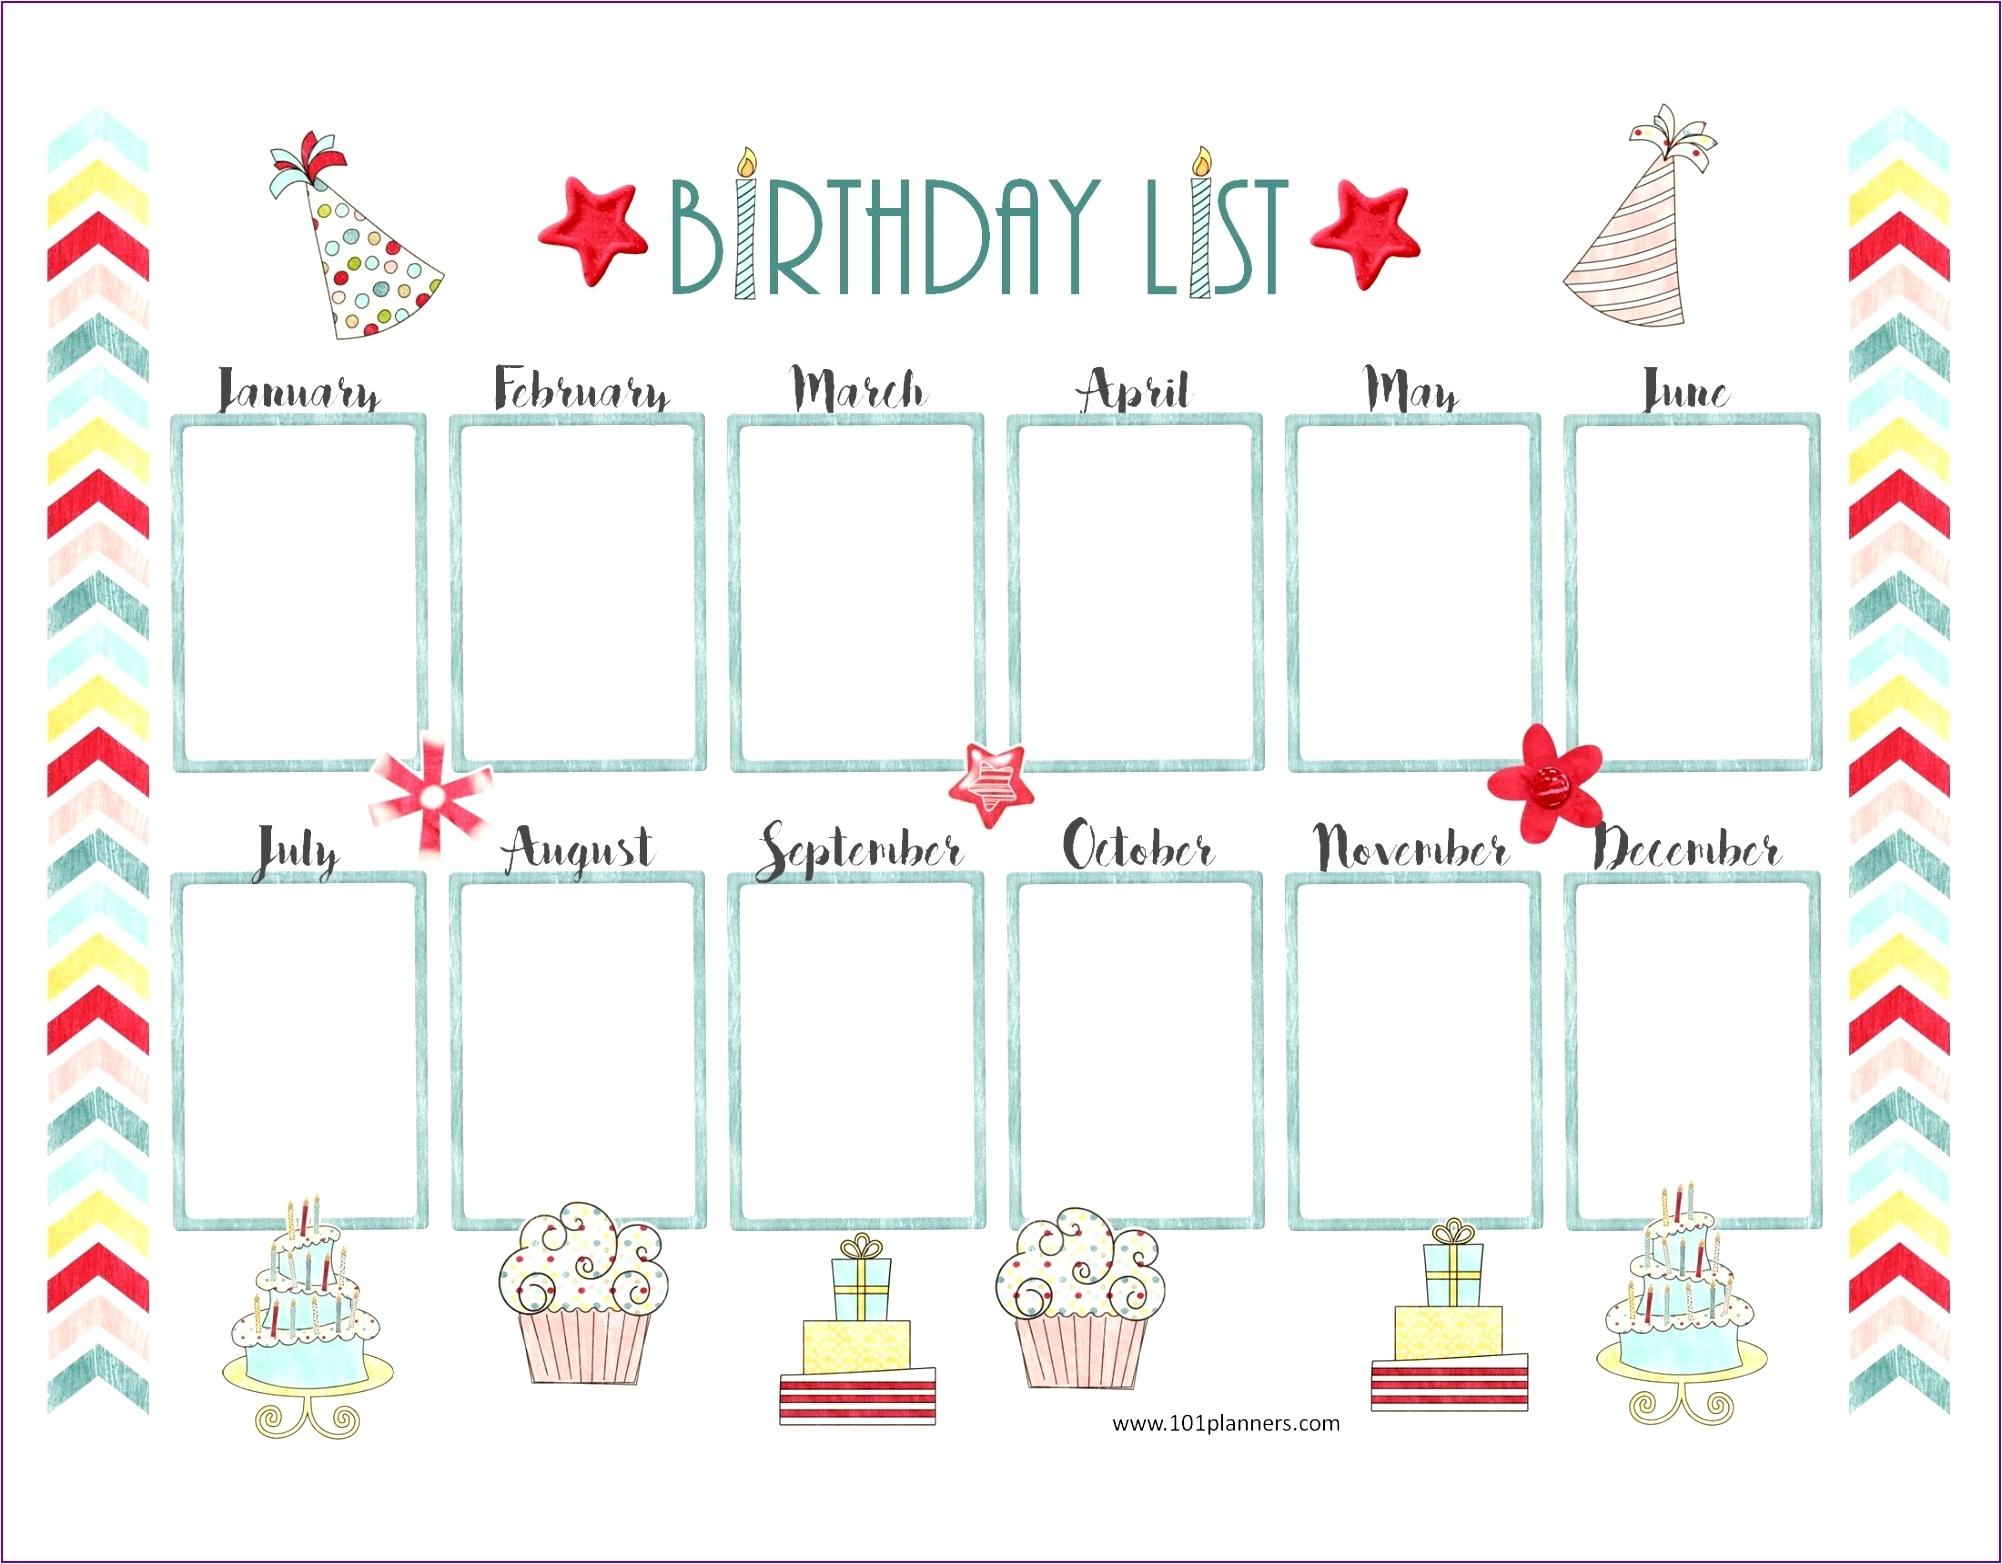 Birthday Calendar Template Excel 14 Free Birthday Calendar Template inside Free Images Of Birthday Calanders